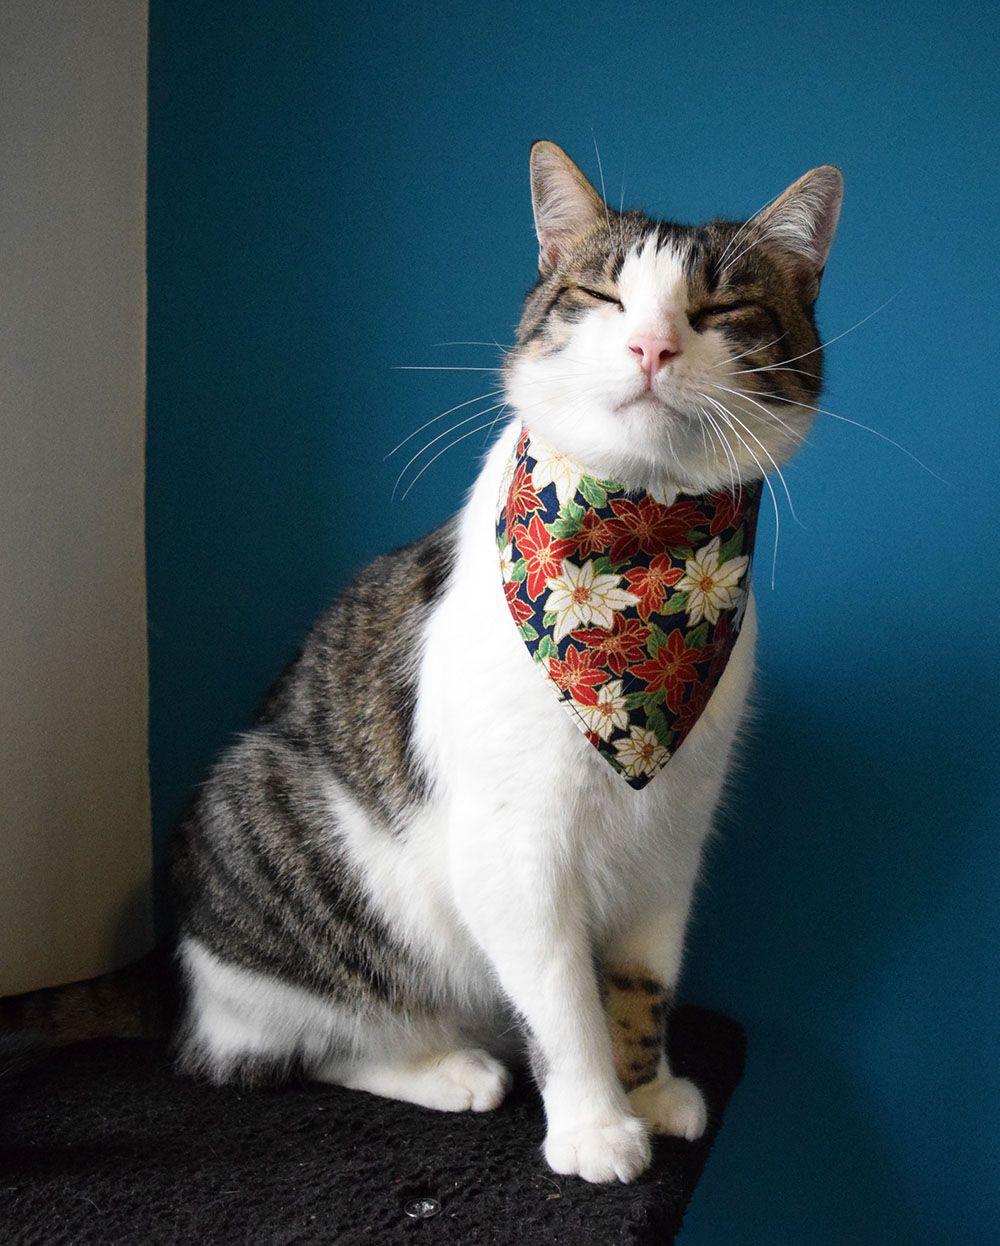 Handmade cat bandana with Christmas flower print.